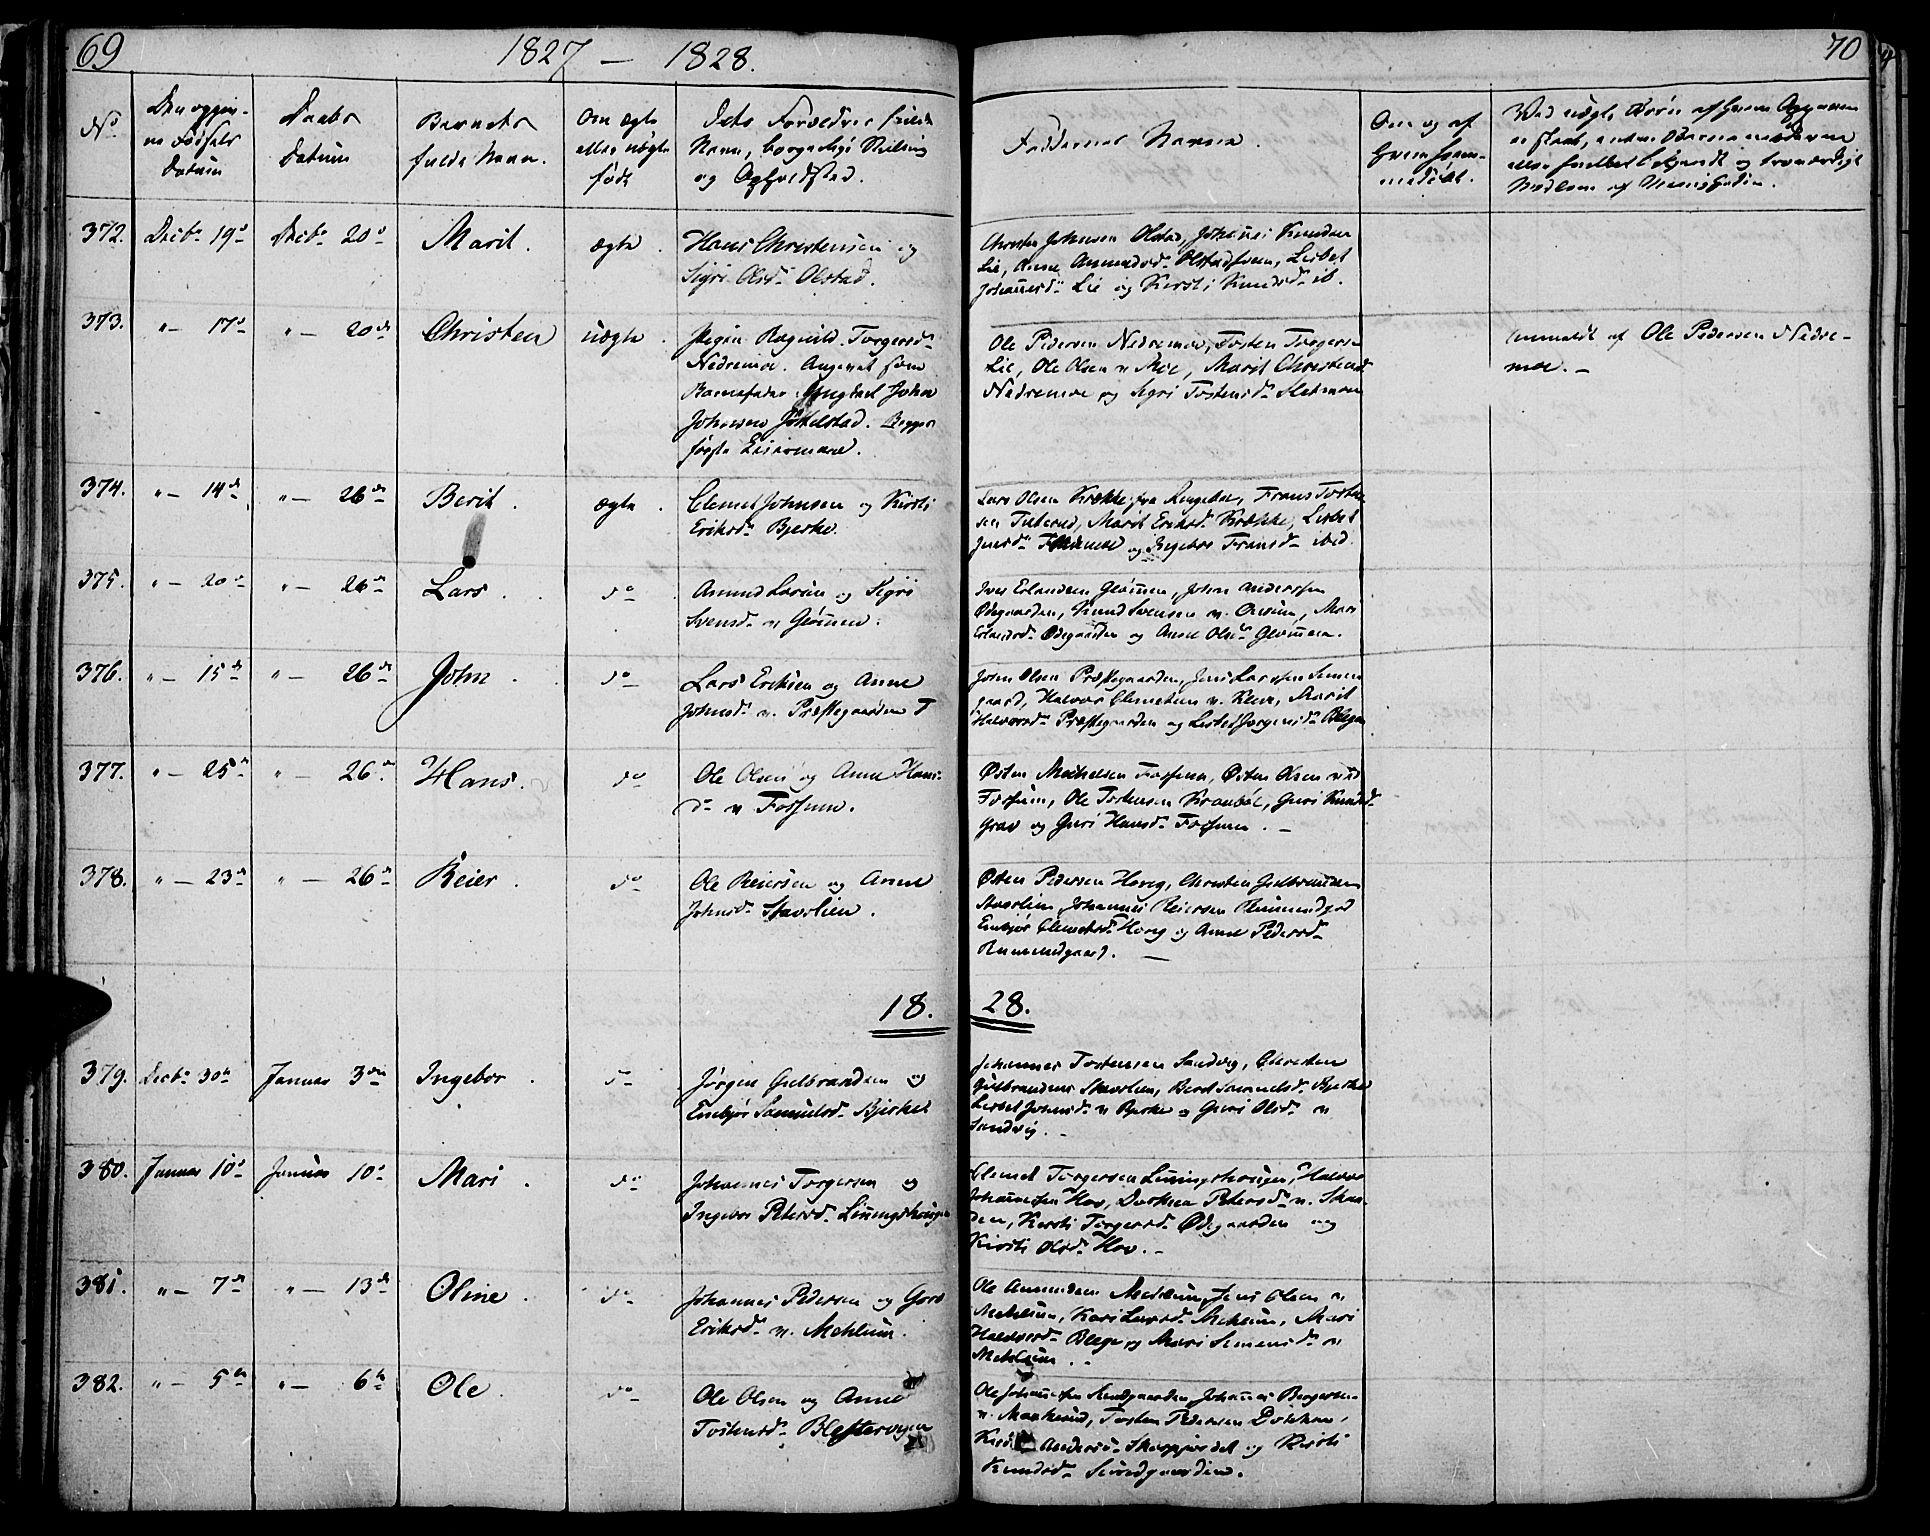 SAH, Øyer prestekontor, Ministerialbok nr. 4, 1824-1841, s. 69-70